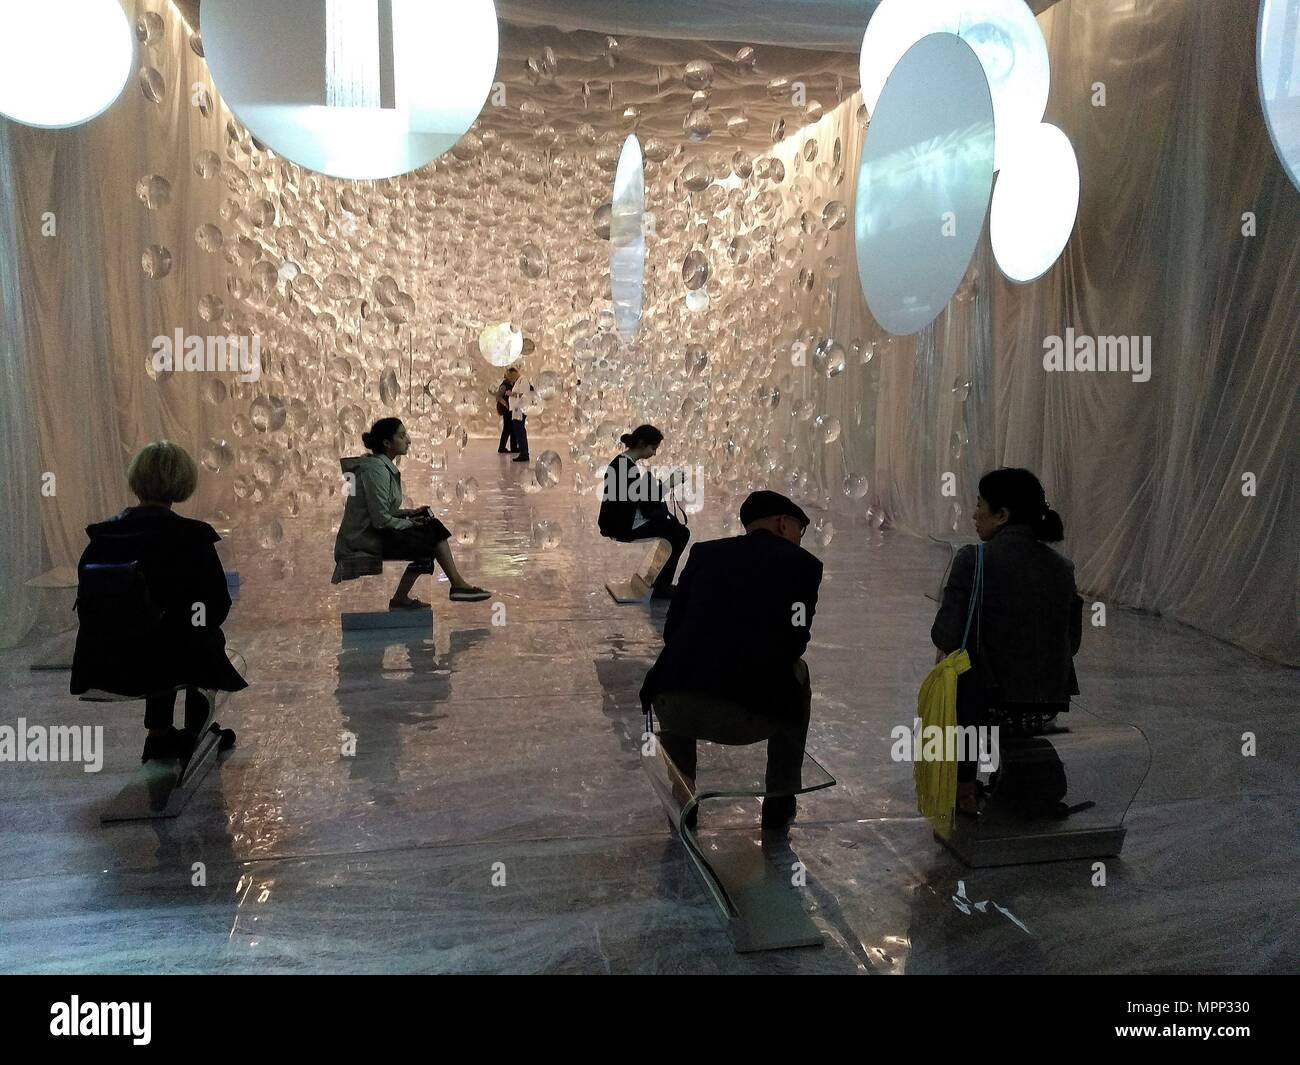 Several people visit the exhibition 'Sueno and Naturaleza